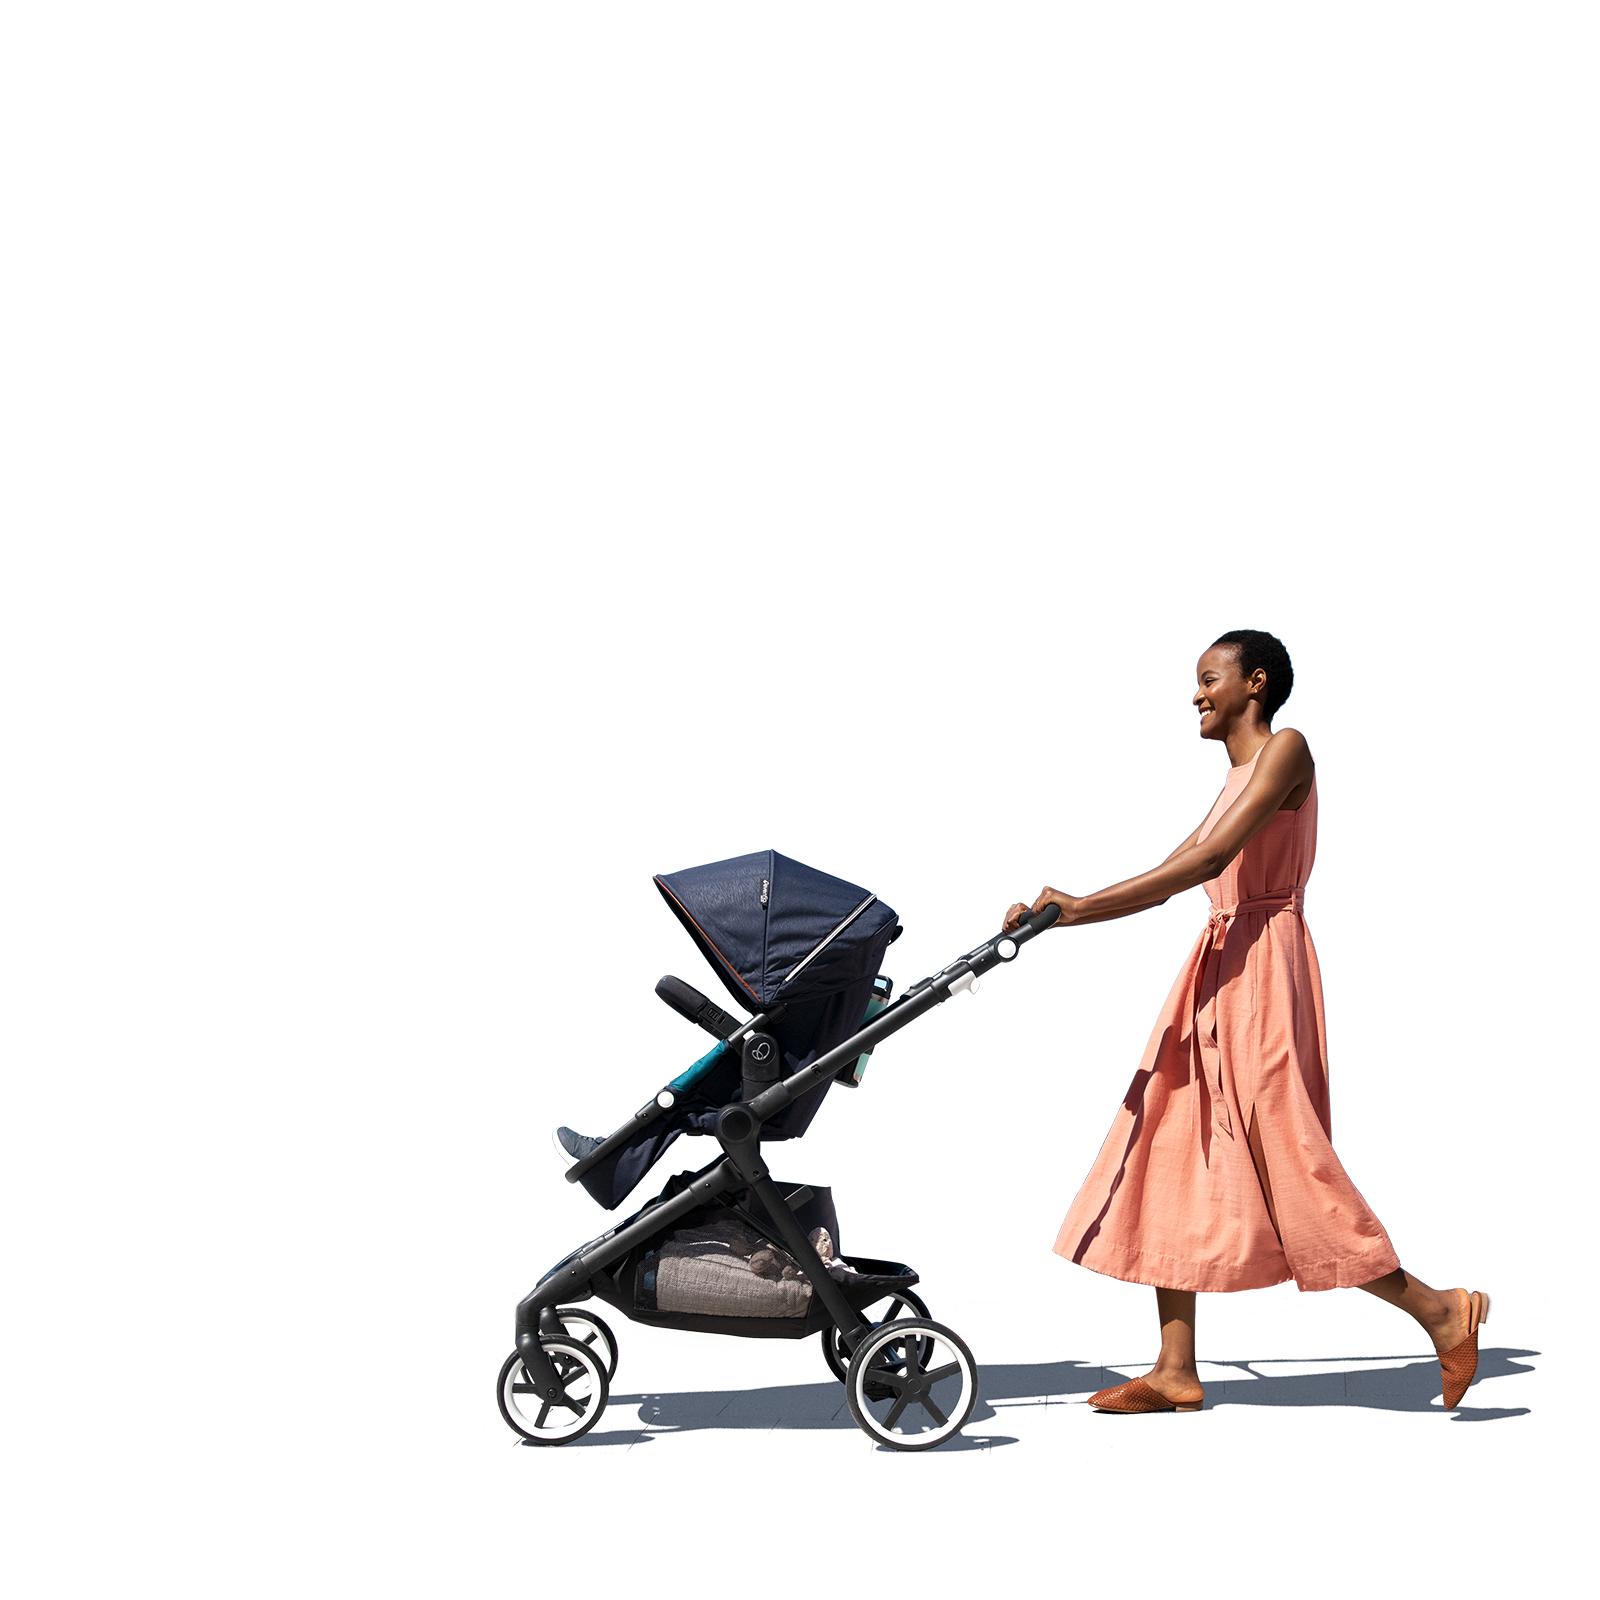 Evenflo Gold Car seat and stroller, Stroller, Evenflo